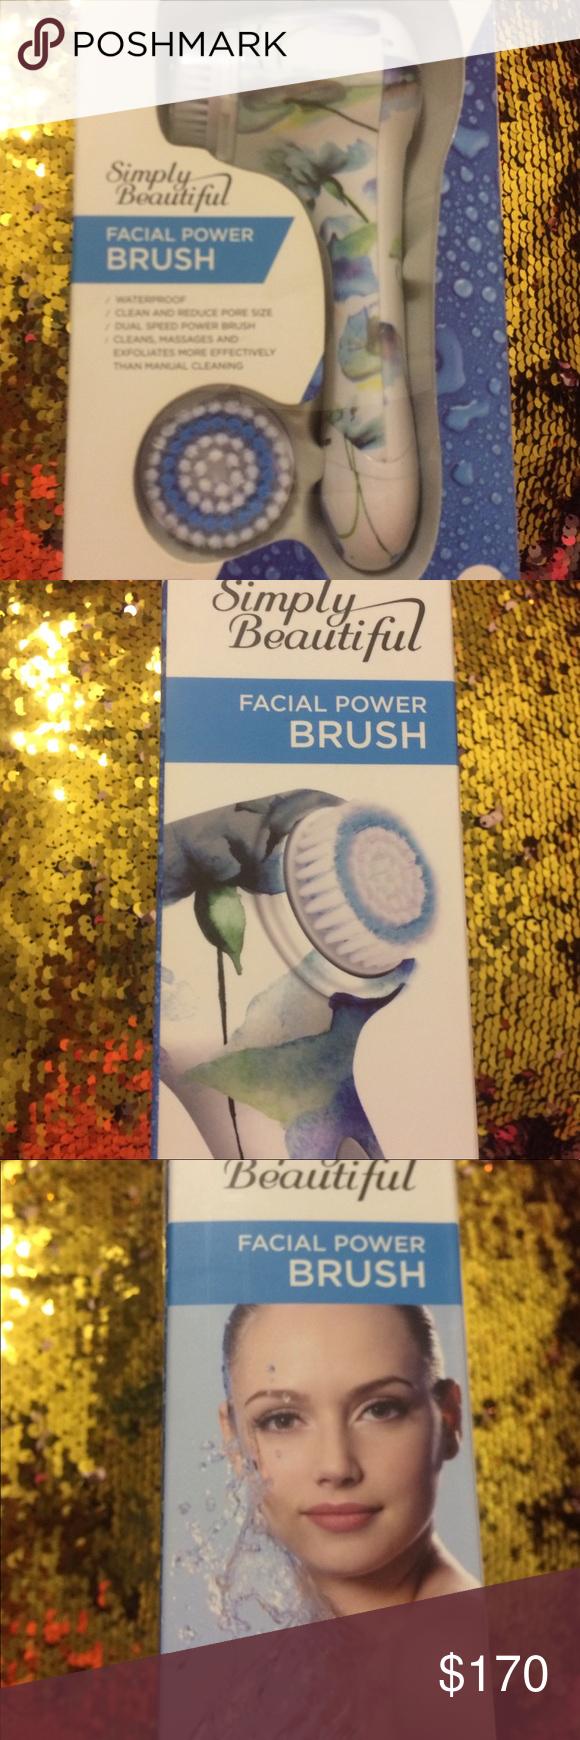 Mini Electric Facial Cleaning Massage Brush Washing